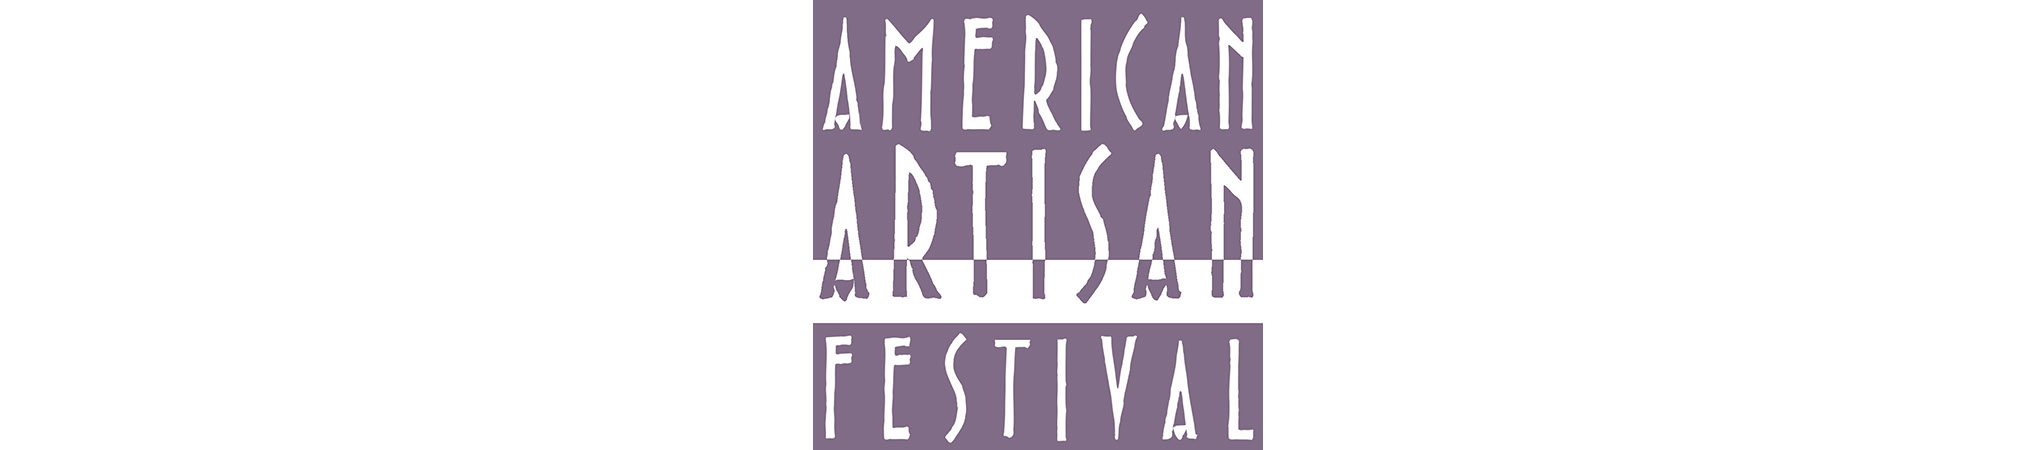 American Artisan FestivalJune 14, 15 & 16Centennial Park